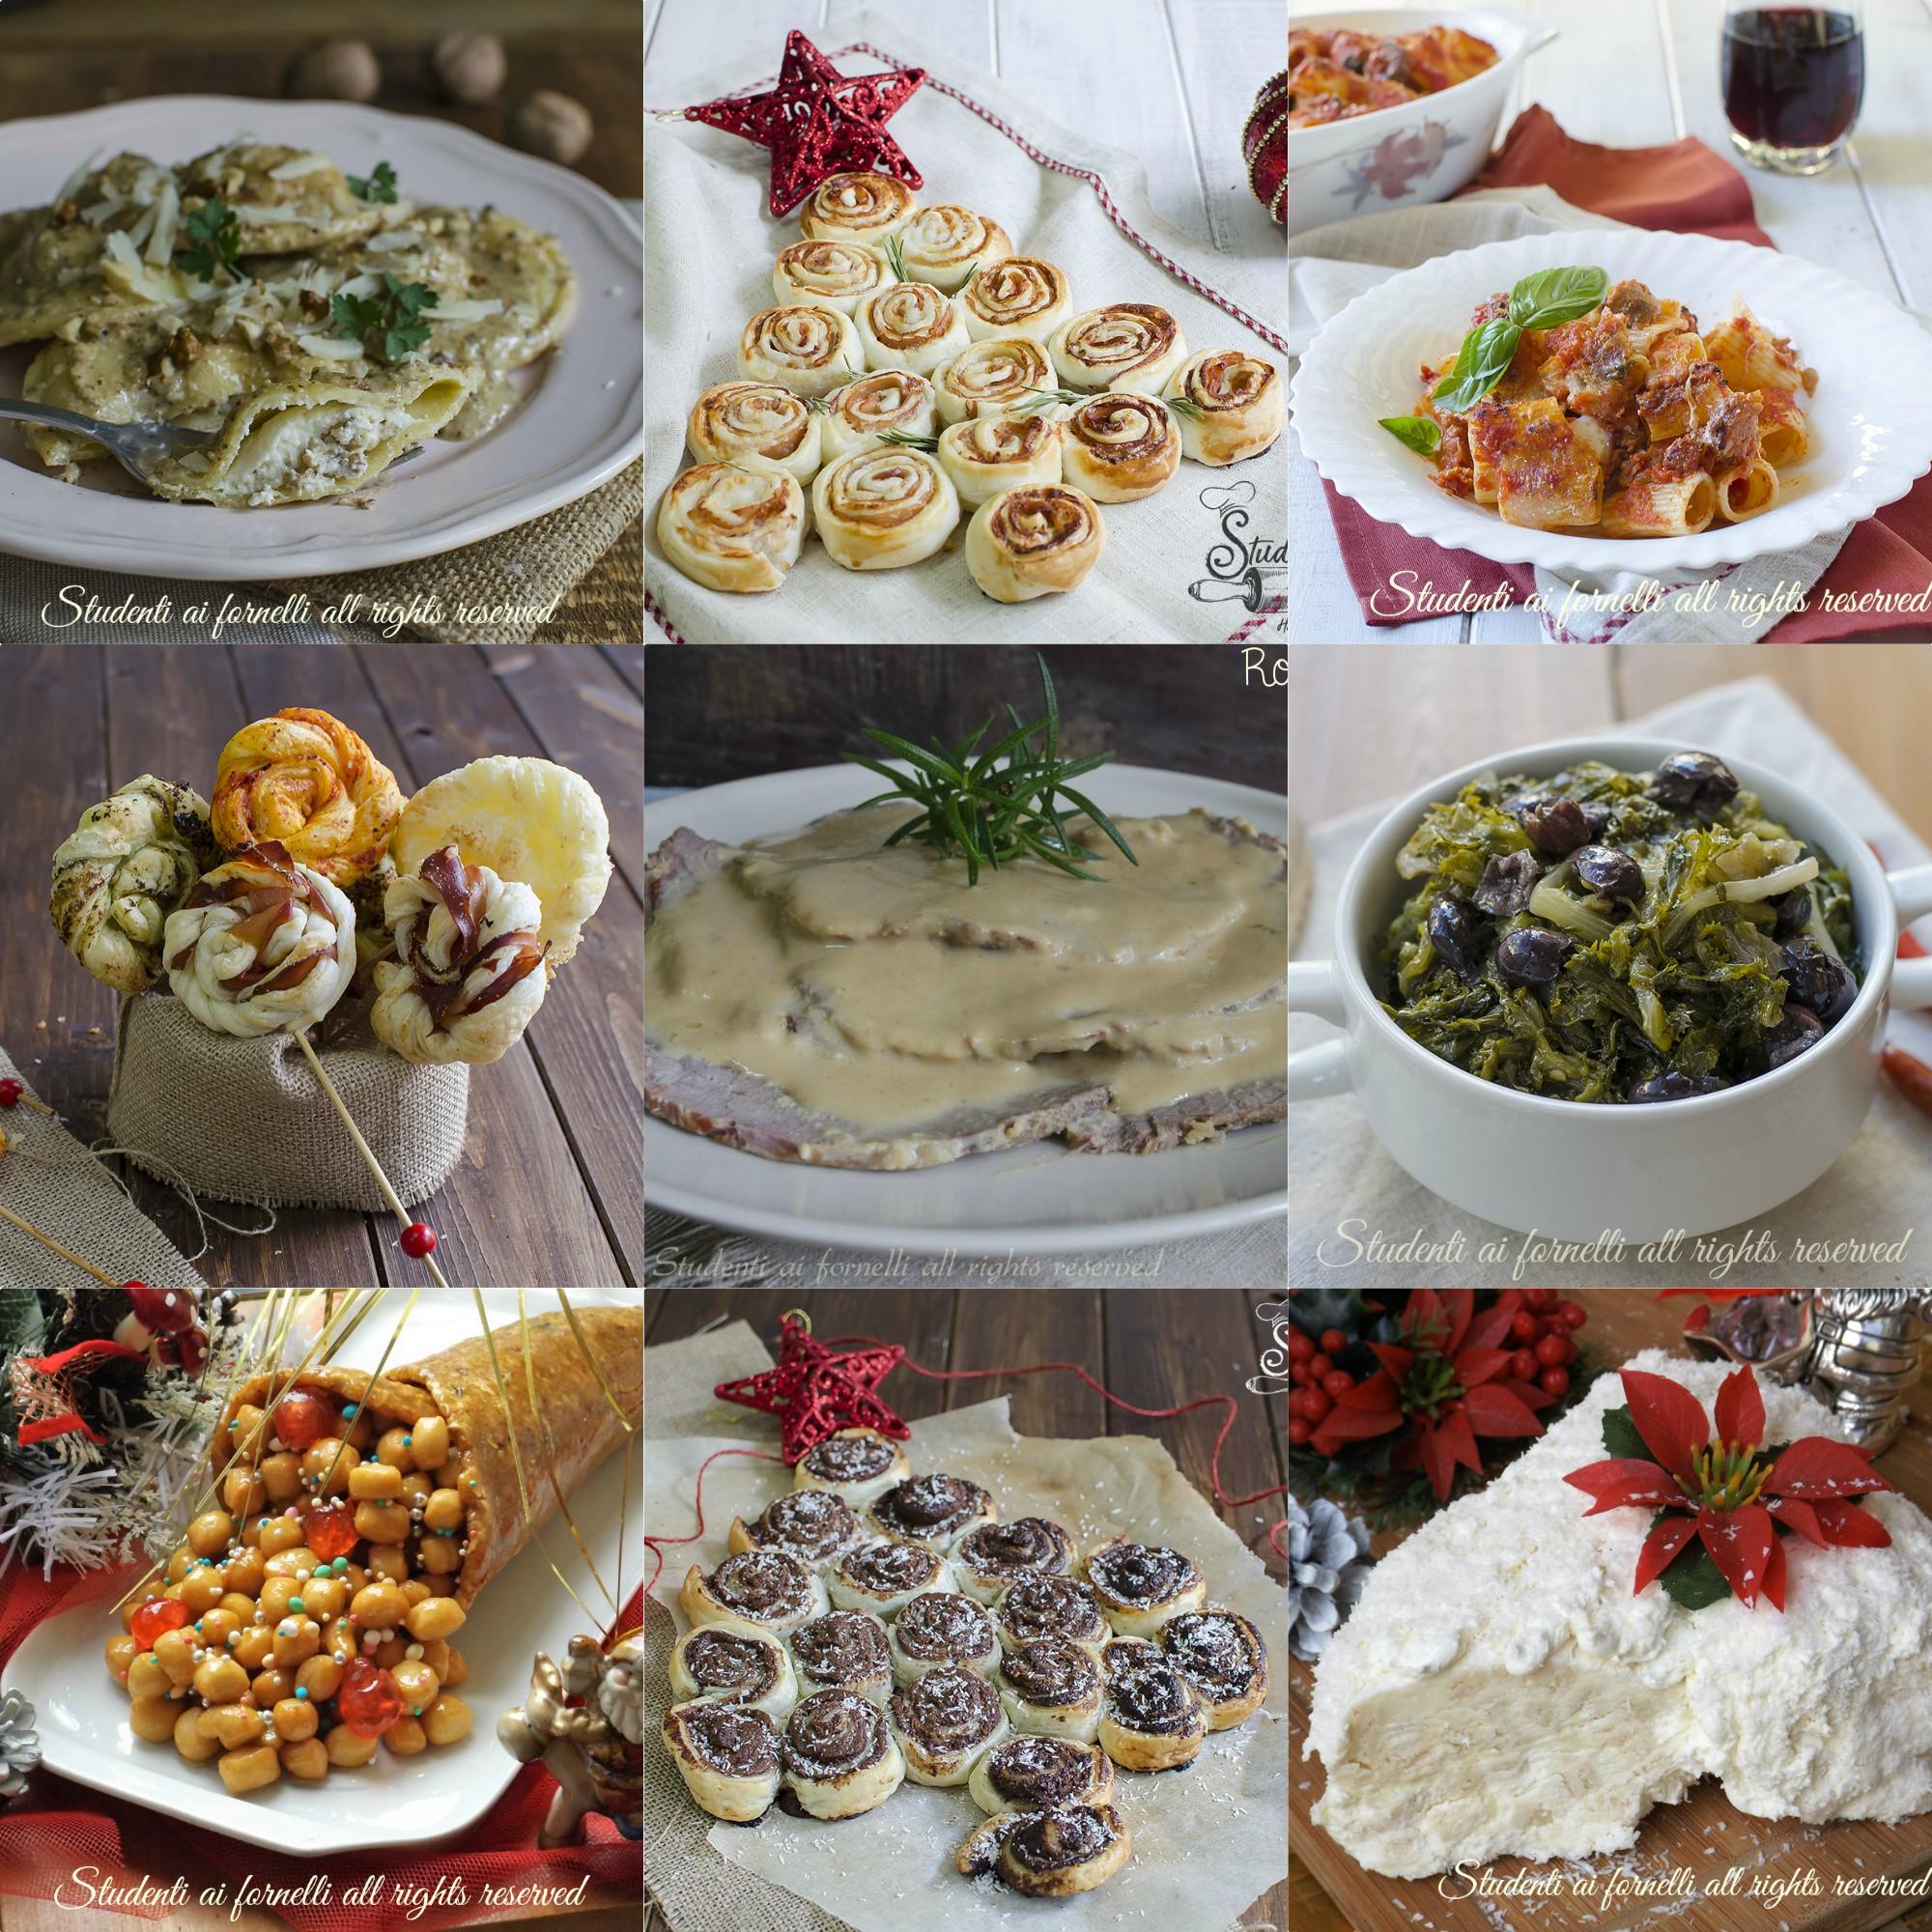 Natale 2017 ricette facili antipasti primi secondi dolci for Ricette facili dolci